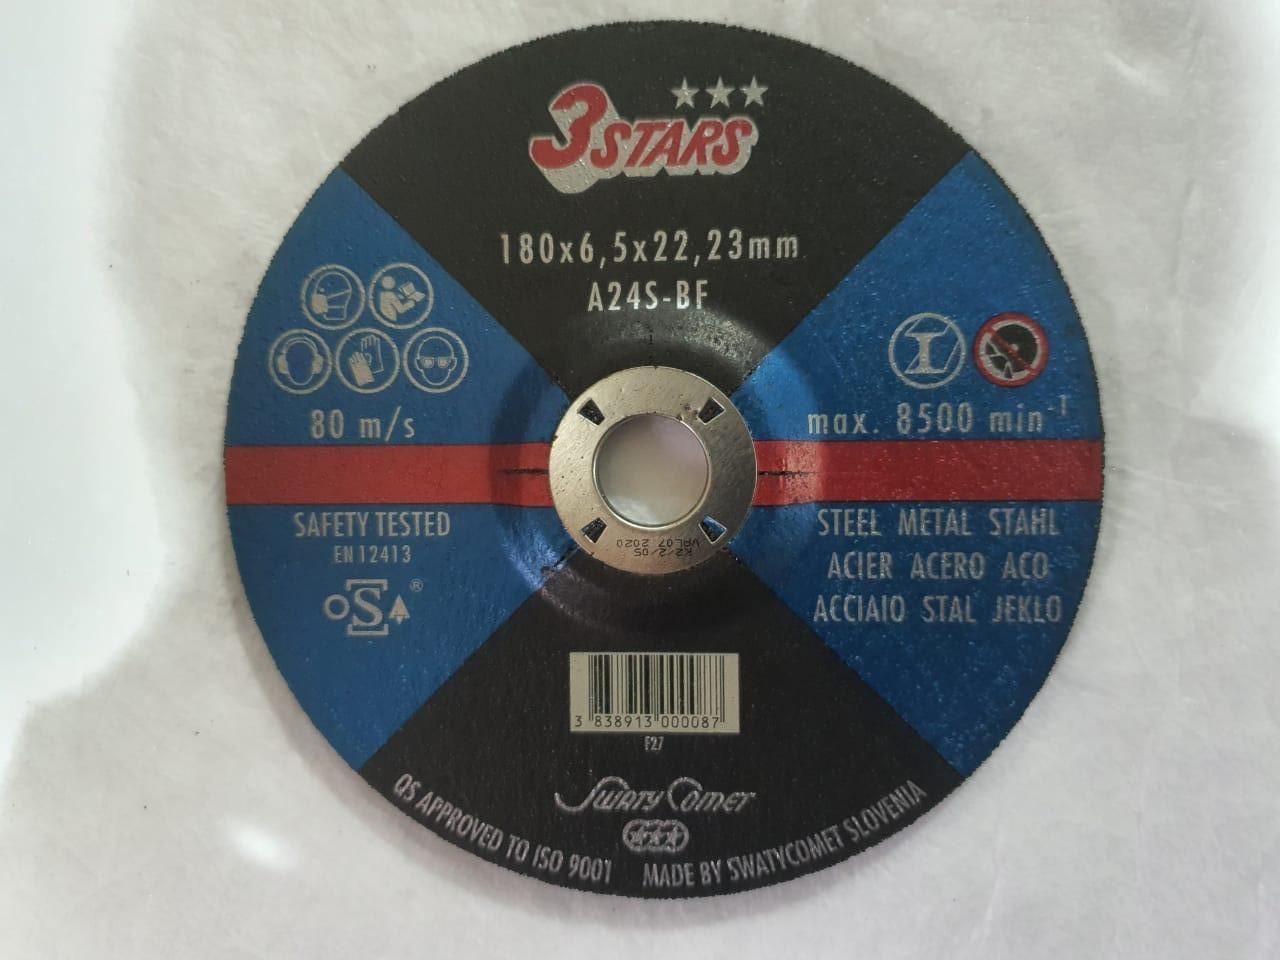 Круг шлифовальный Metal 180 х 6,5 х 22,2 3STARS A24S-BF (Weiler Abrasives, Slovenija)